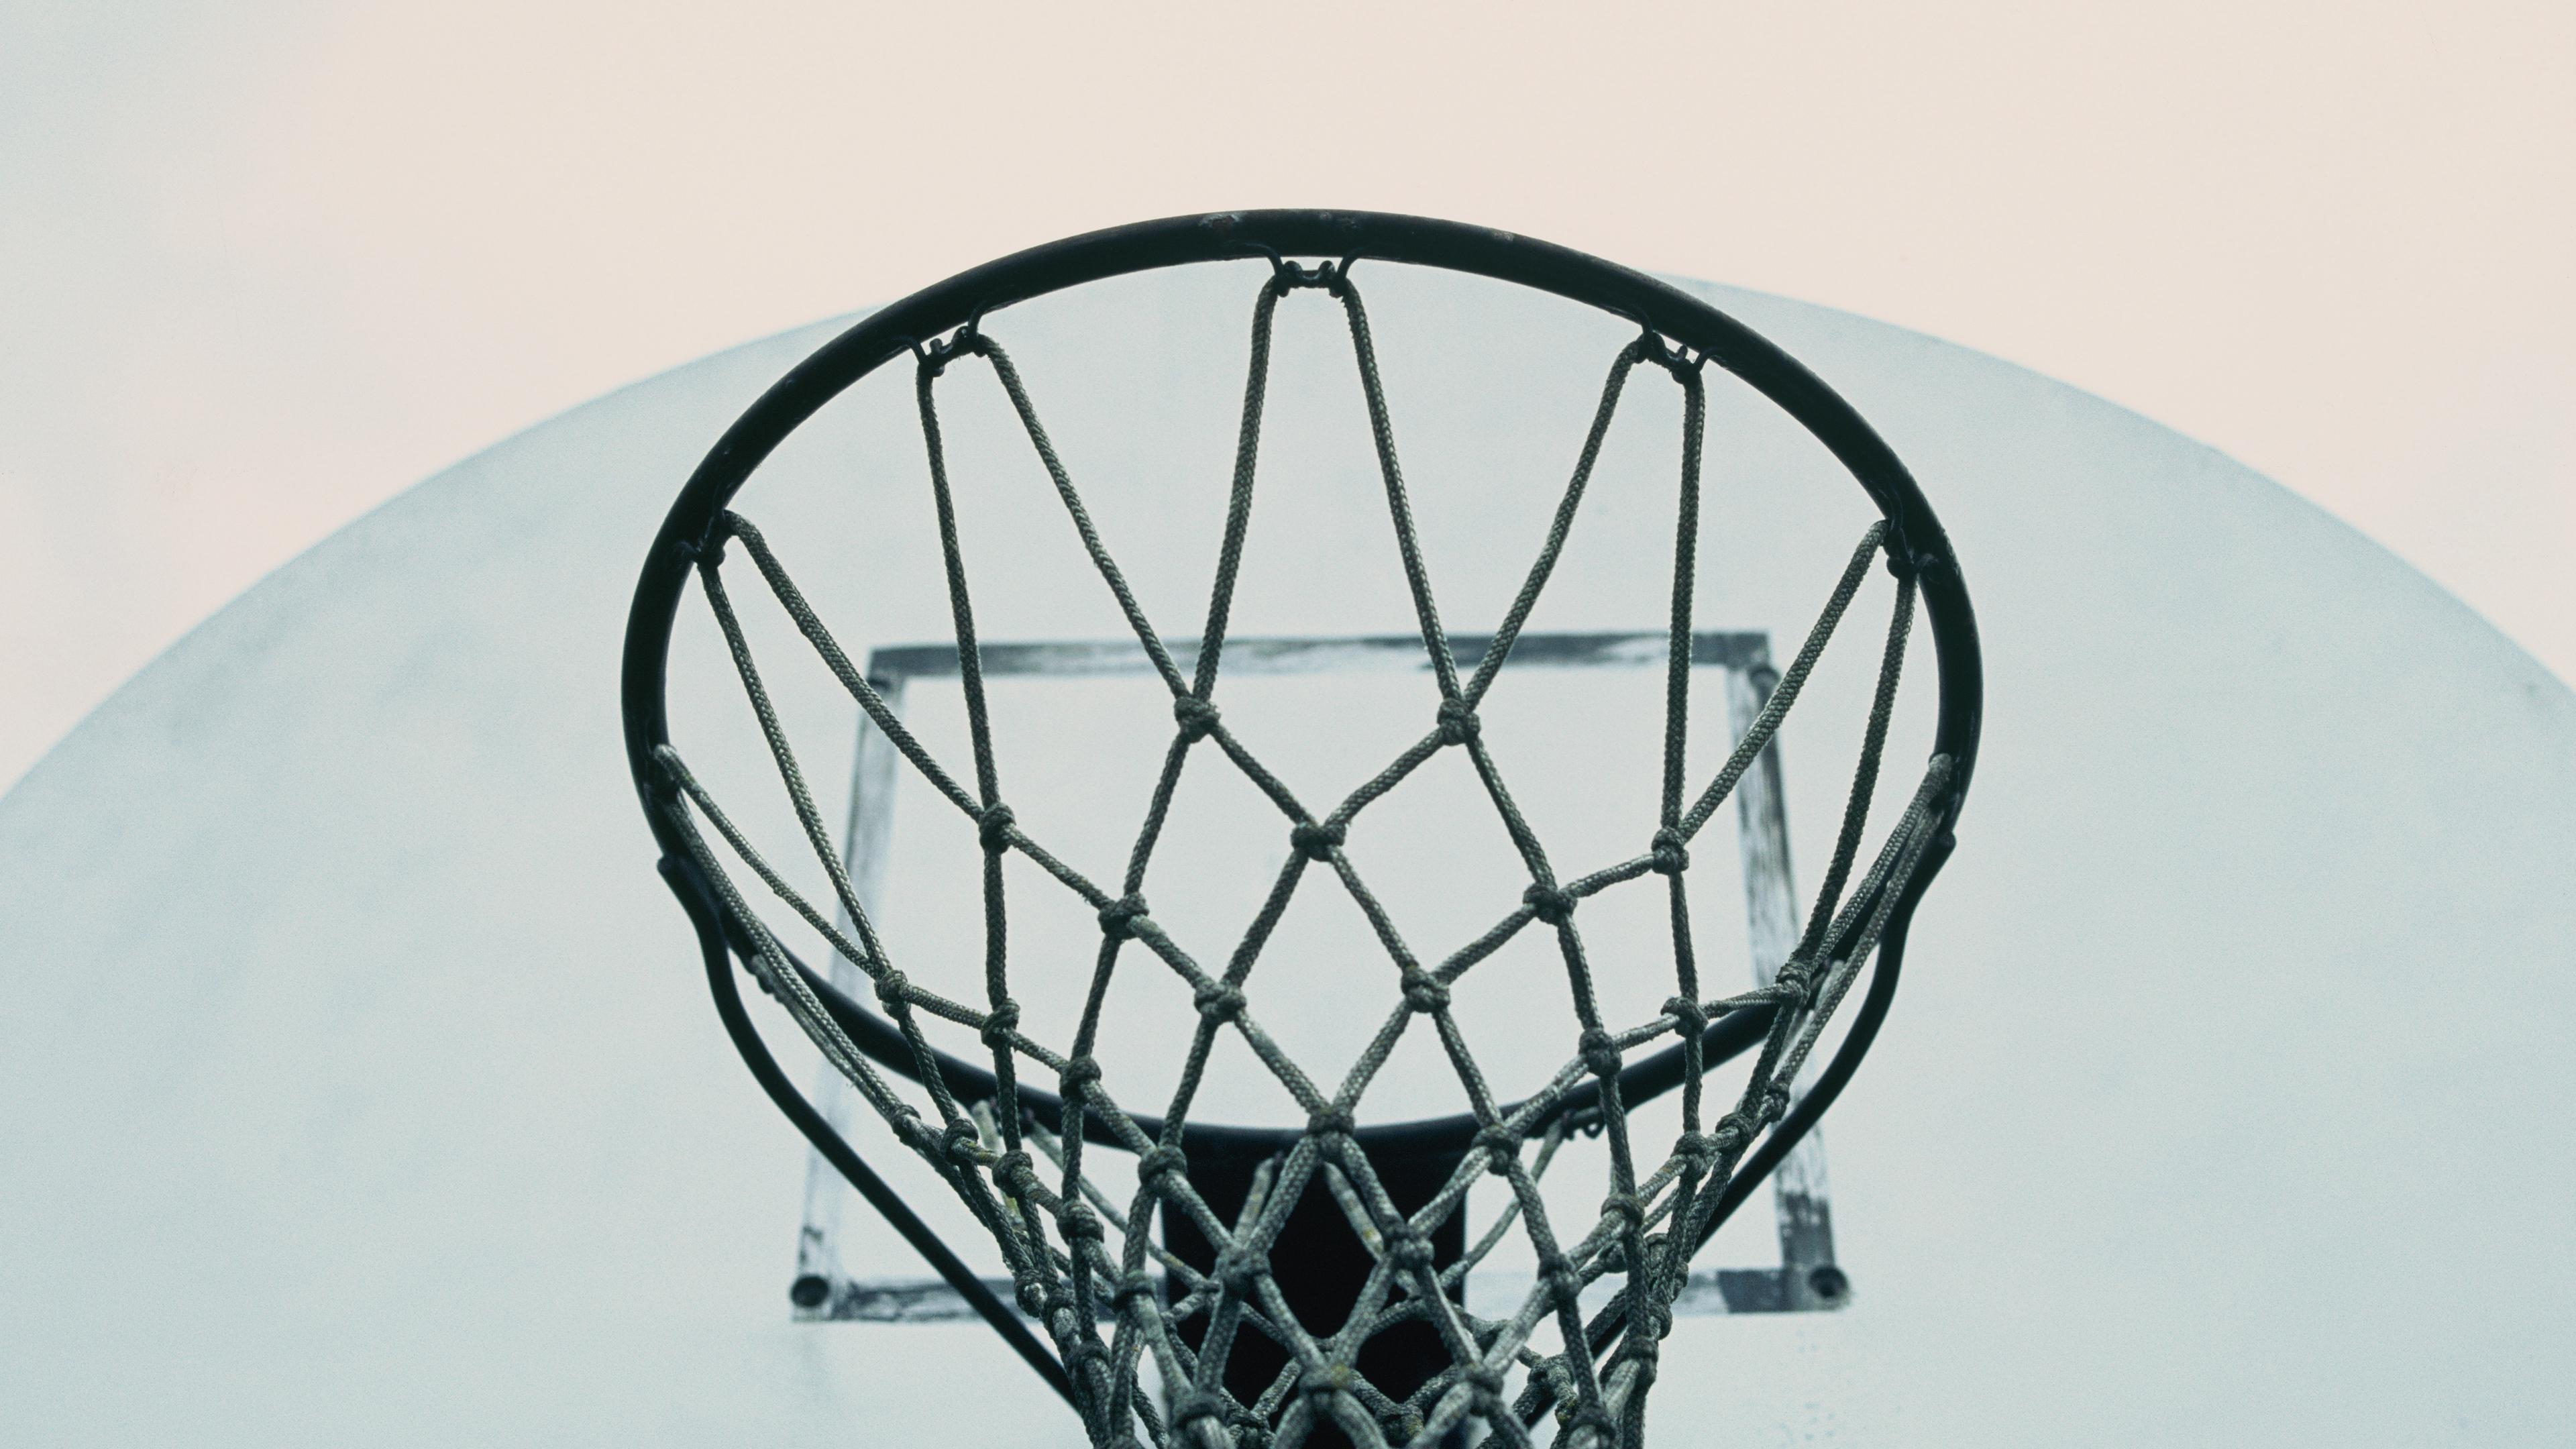 basketball net ring 4k 1540061537 - basketball, net, ring 4k - Ring, net, Basketball